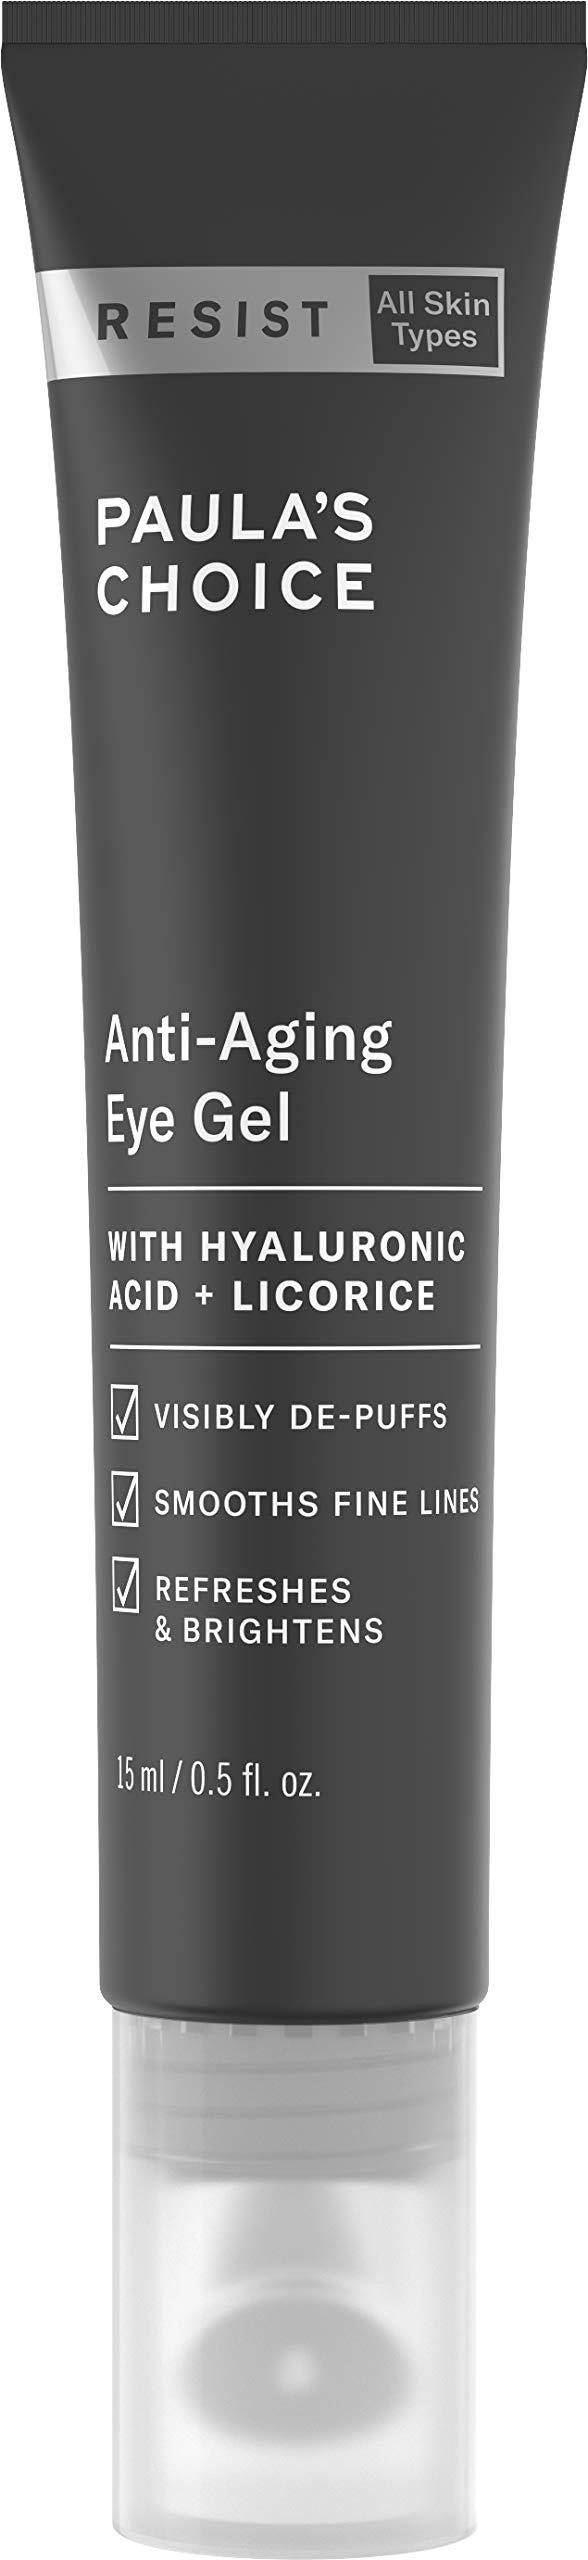 Paula's Choice RESIST Anti-Aging Eye Gel, Hyaluronic Acid, Puffy Eyes, Wrinkles, Fine Lines & Crow's Feet, 0.5 Ounce by Paula's Choice